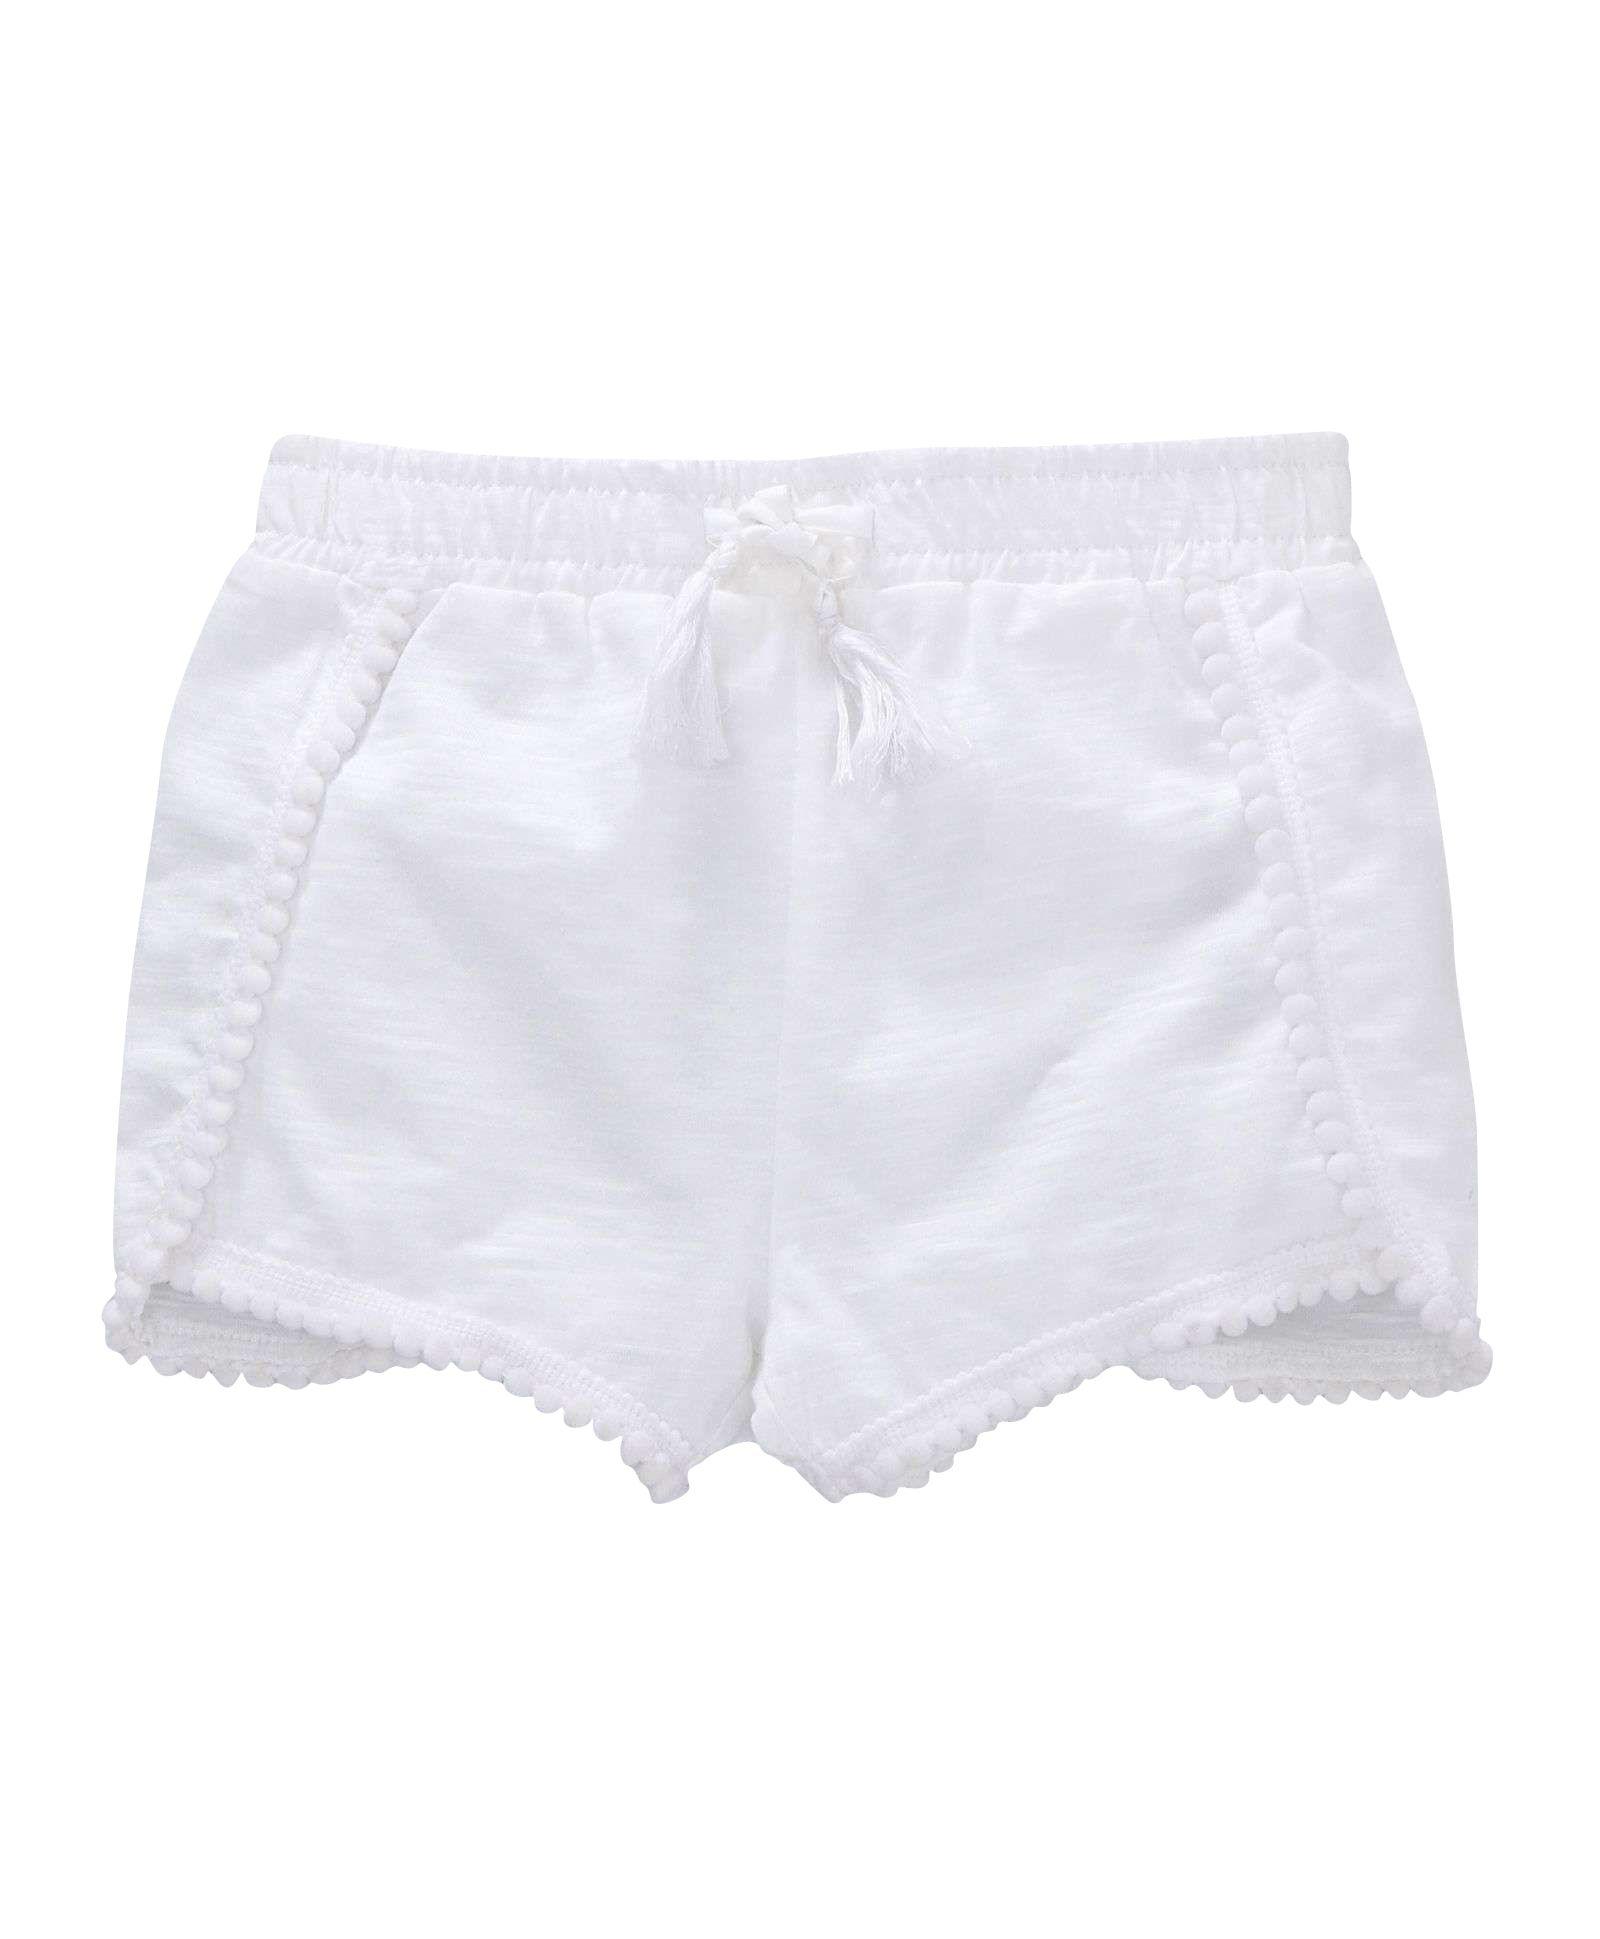 EIMOIE Girls Casual Solid Shorts (White)